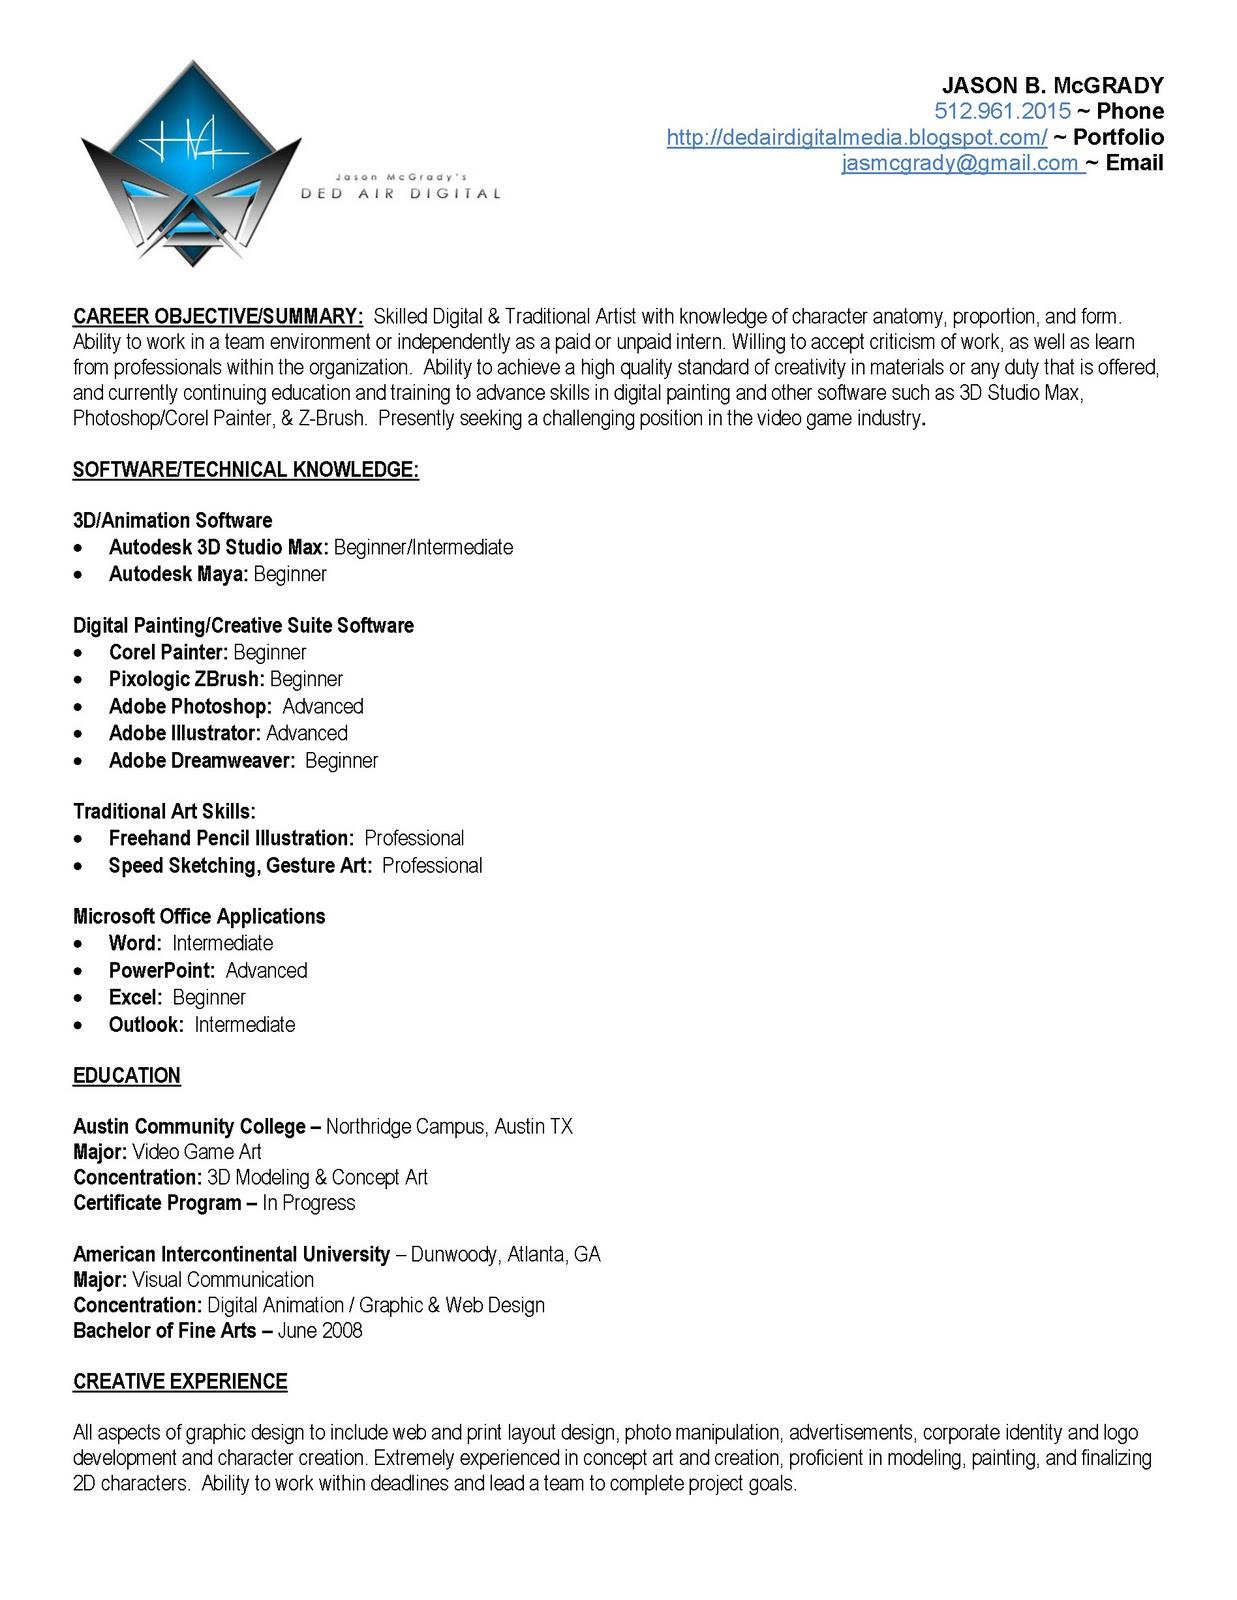 jason mcgrady u0026 39 s ded air digital  current resume